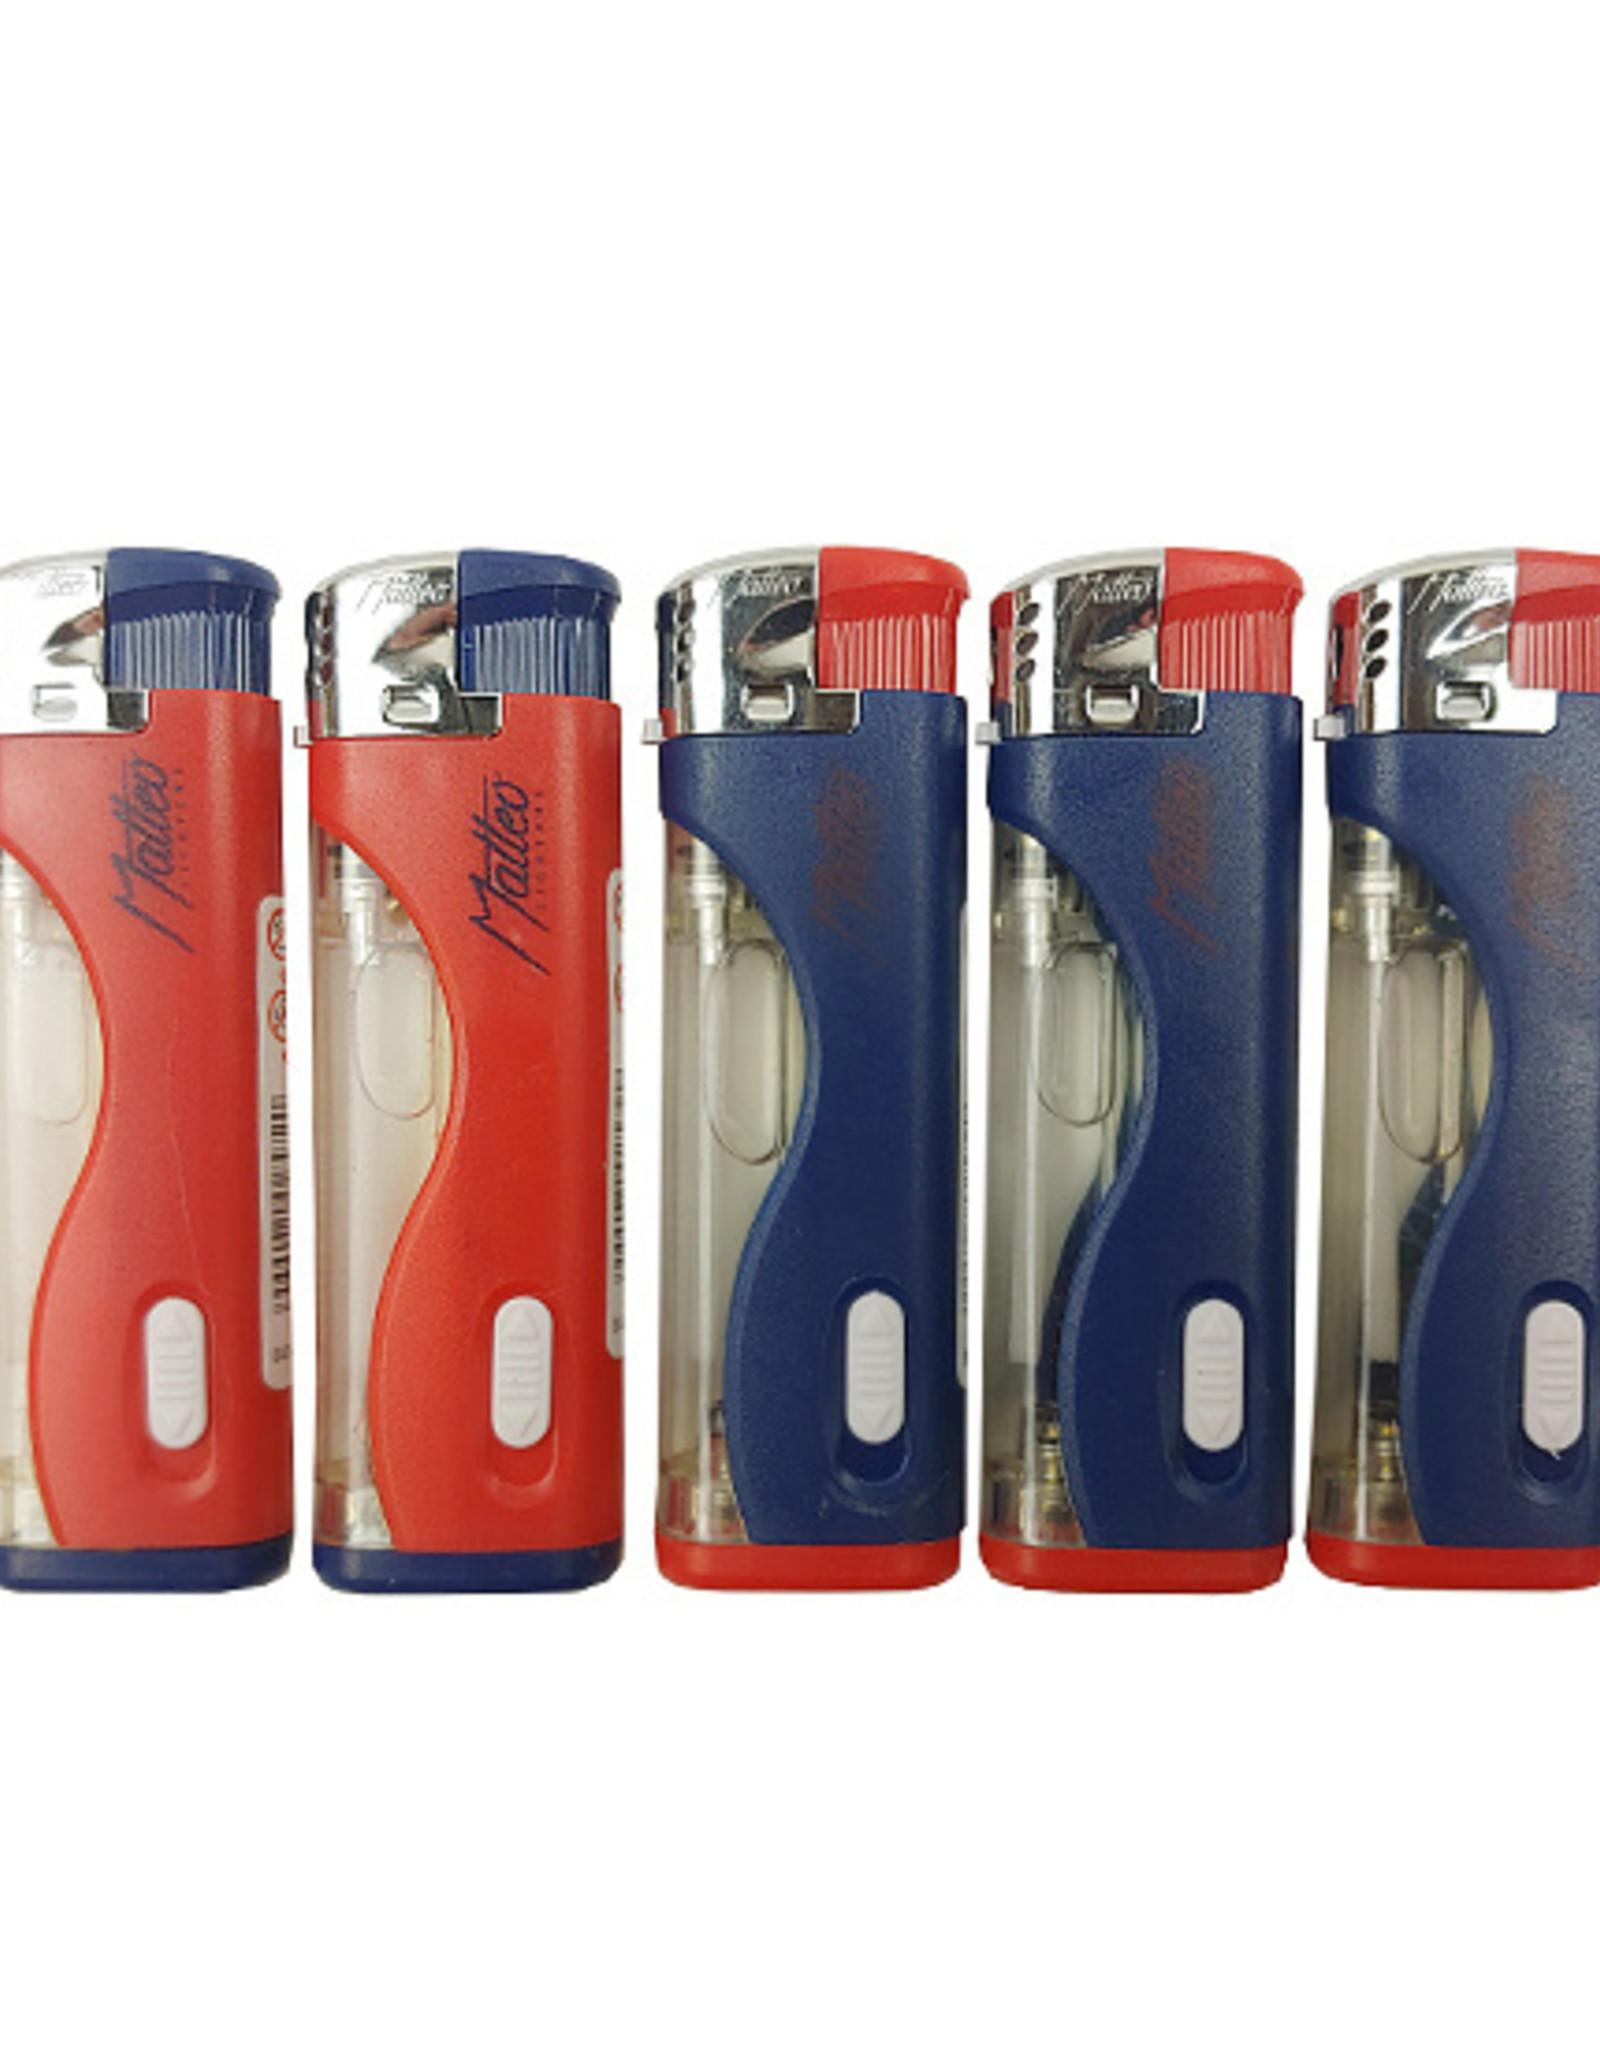 Matteo LED blue/red aanstekers (5 stuks)